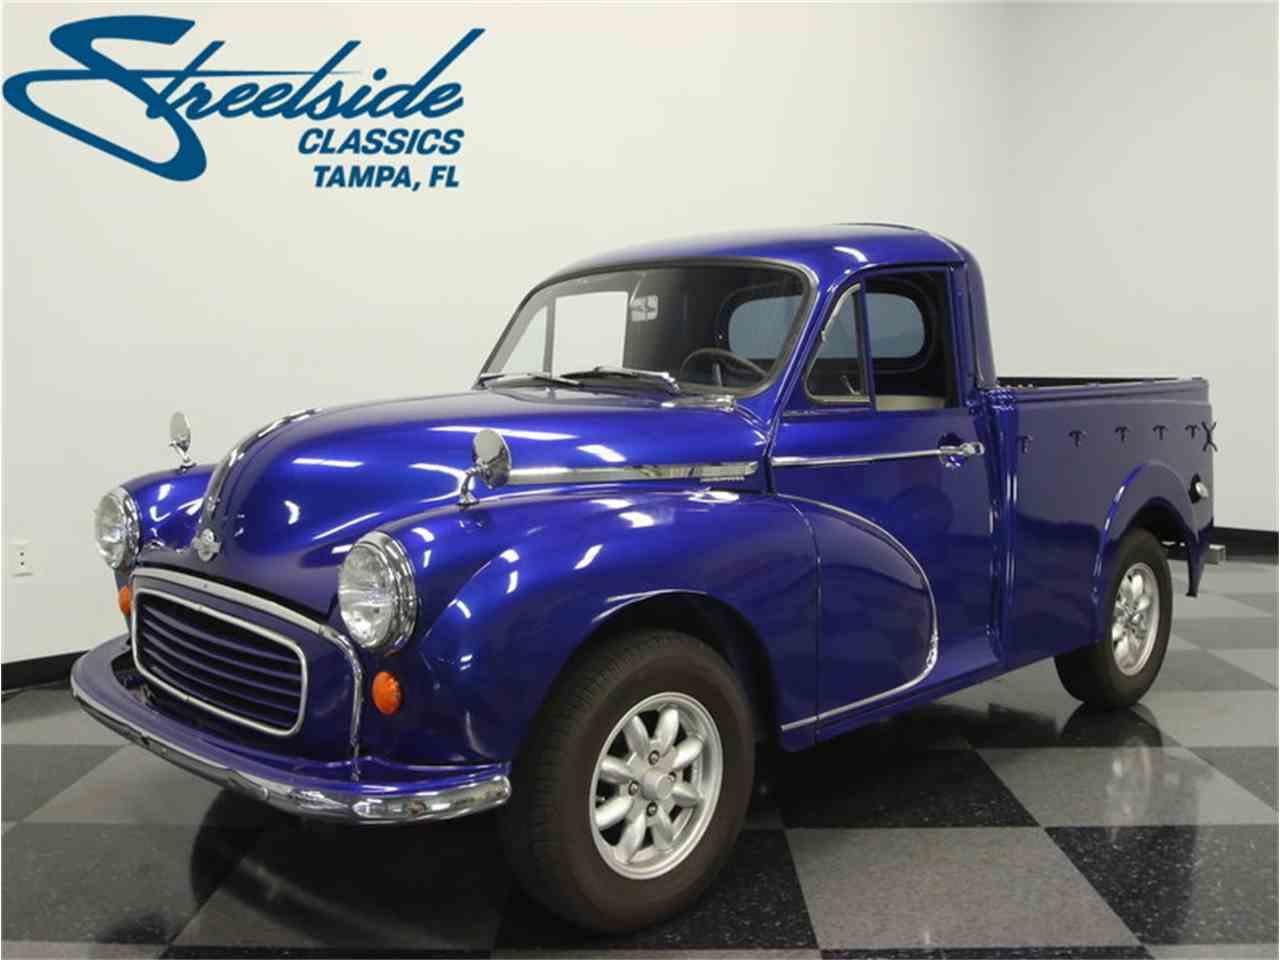 1958 Morris Minor 1000 1/4 Ton Pickup for Sale | ClassicCars.com ...